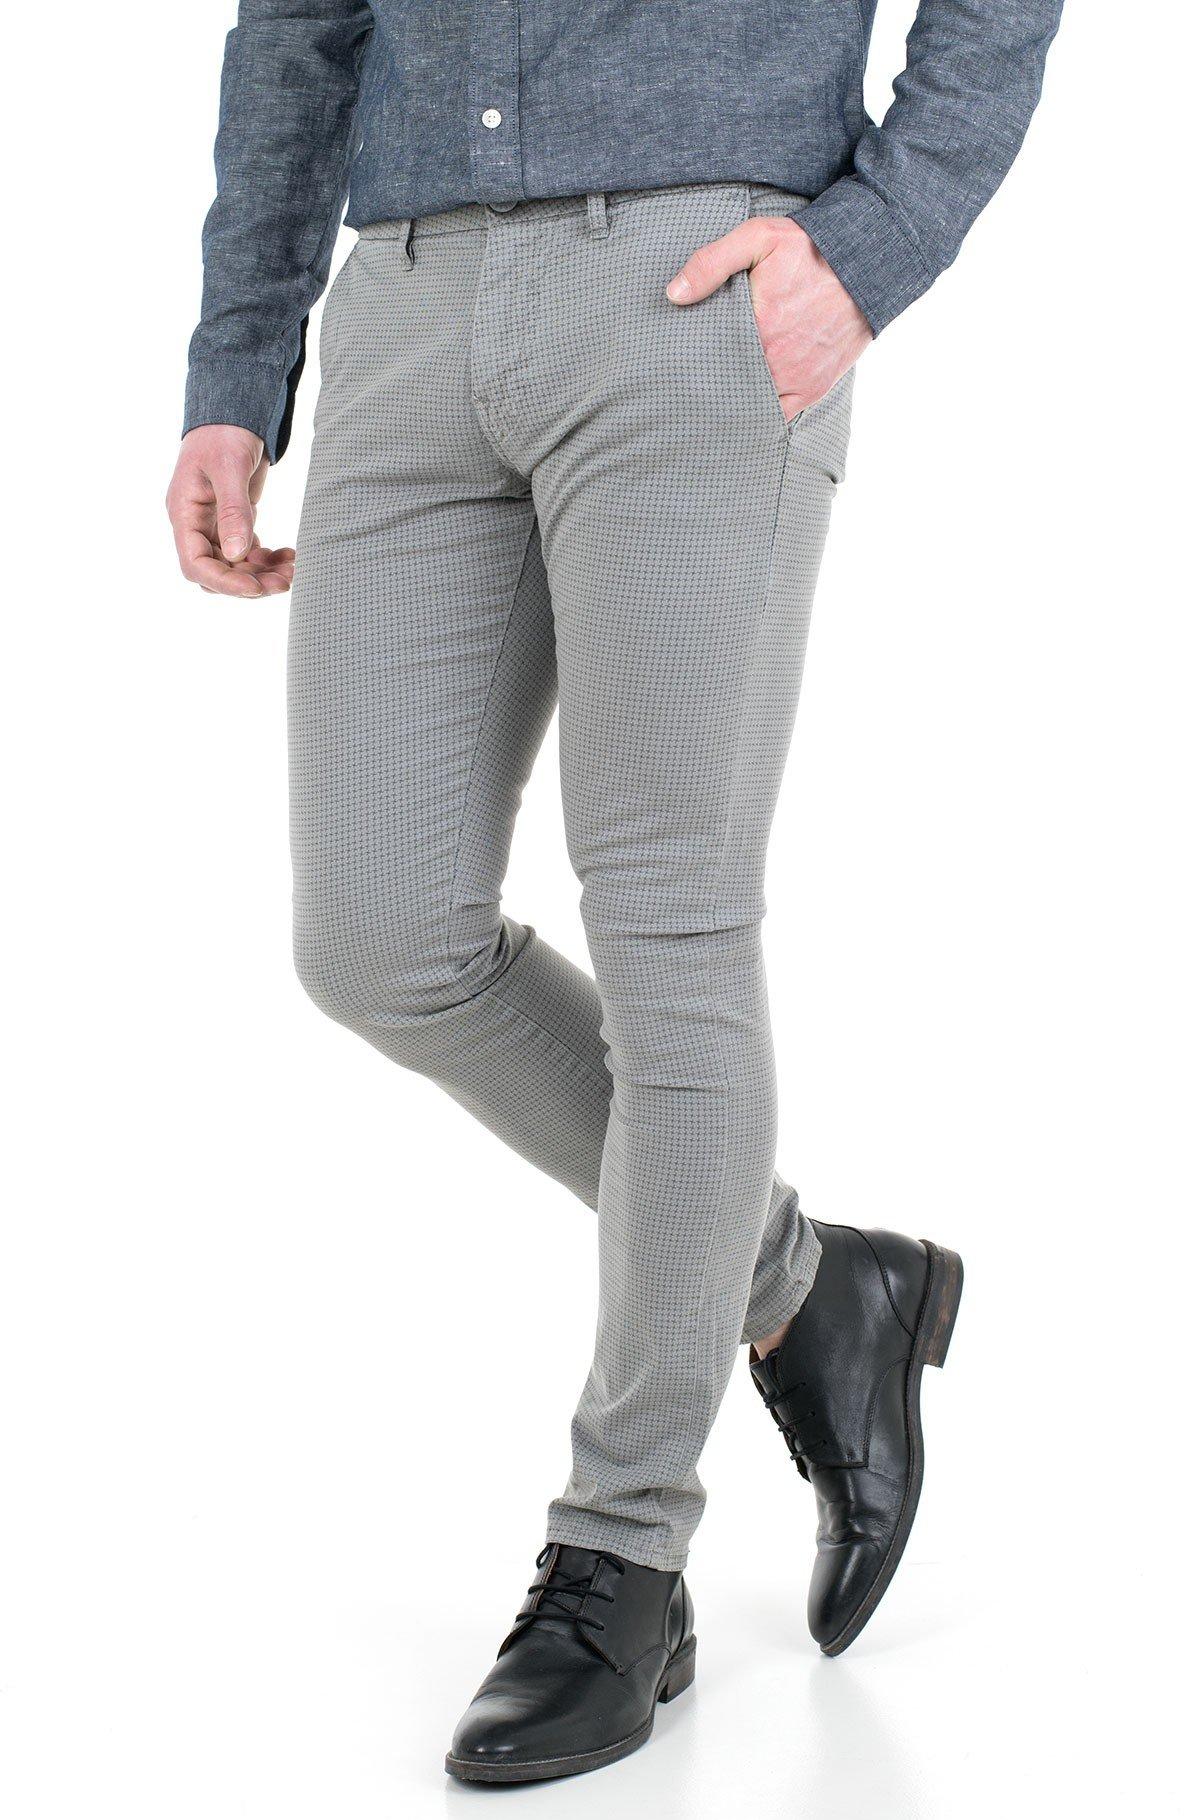 Riidest püksid M1RB29 WCNZ6-full-1